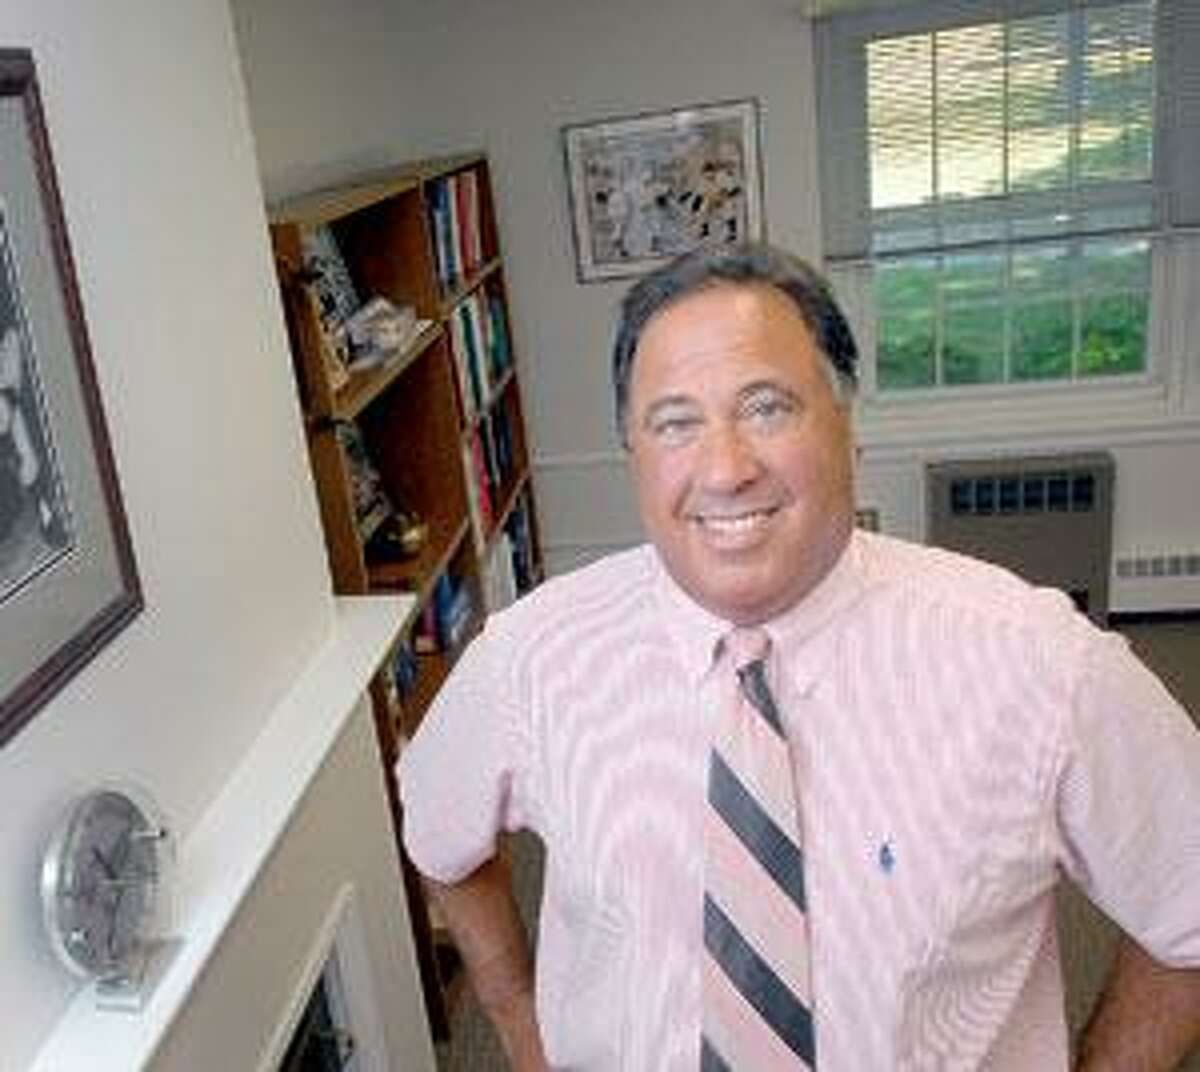 MIlford Superintendent of Schools Harvey B. Polansky.